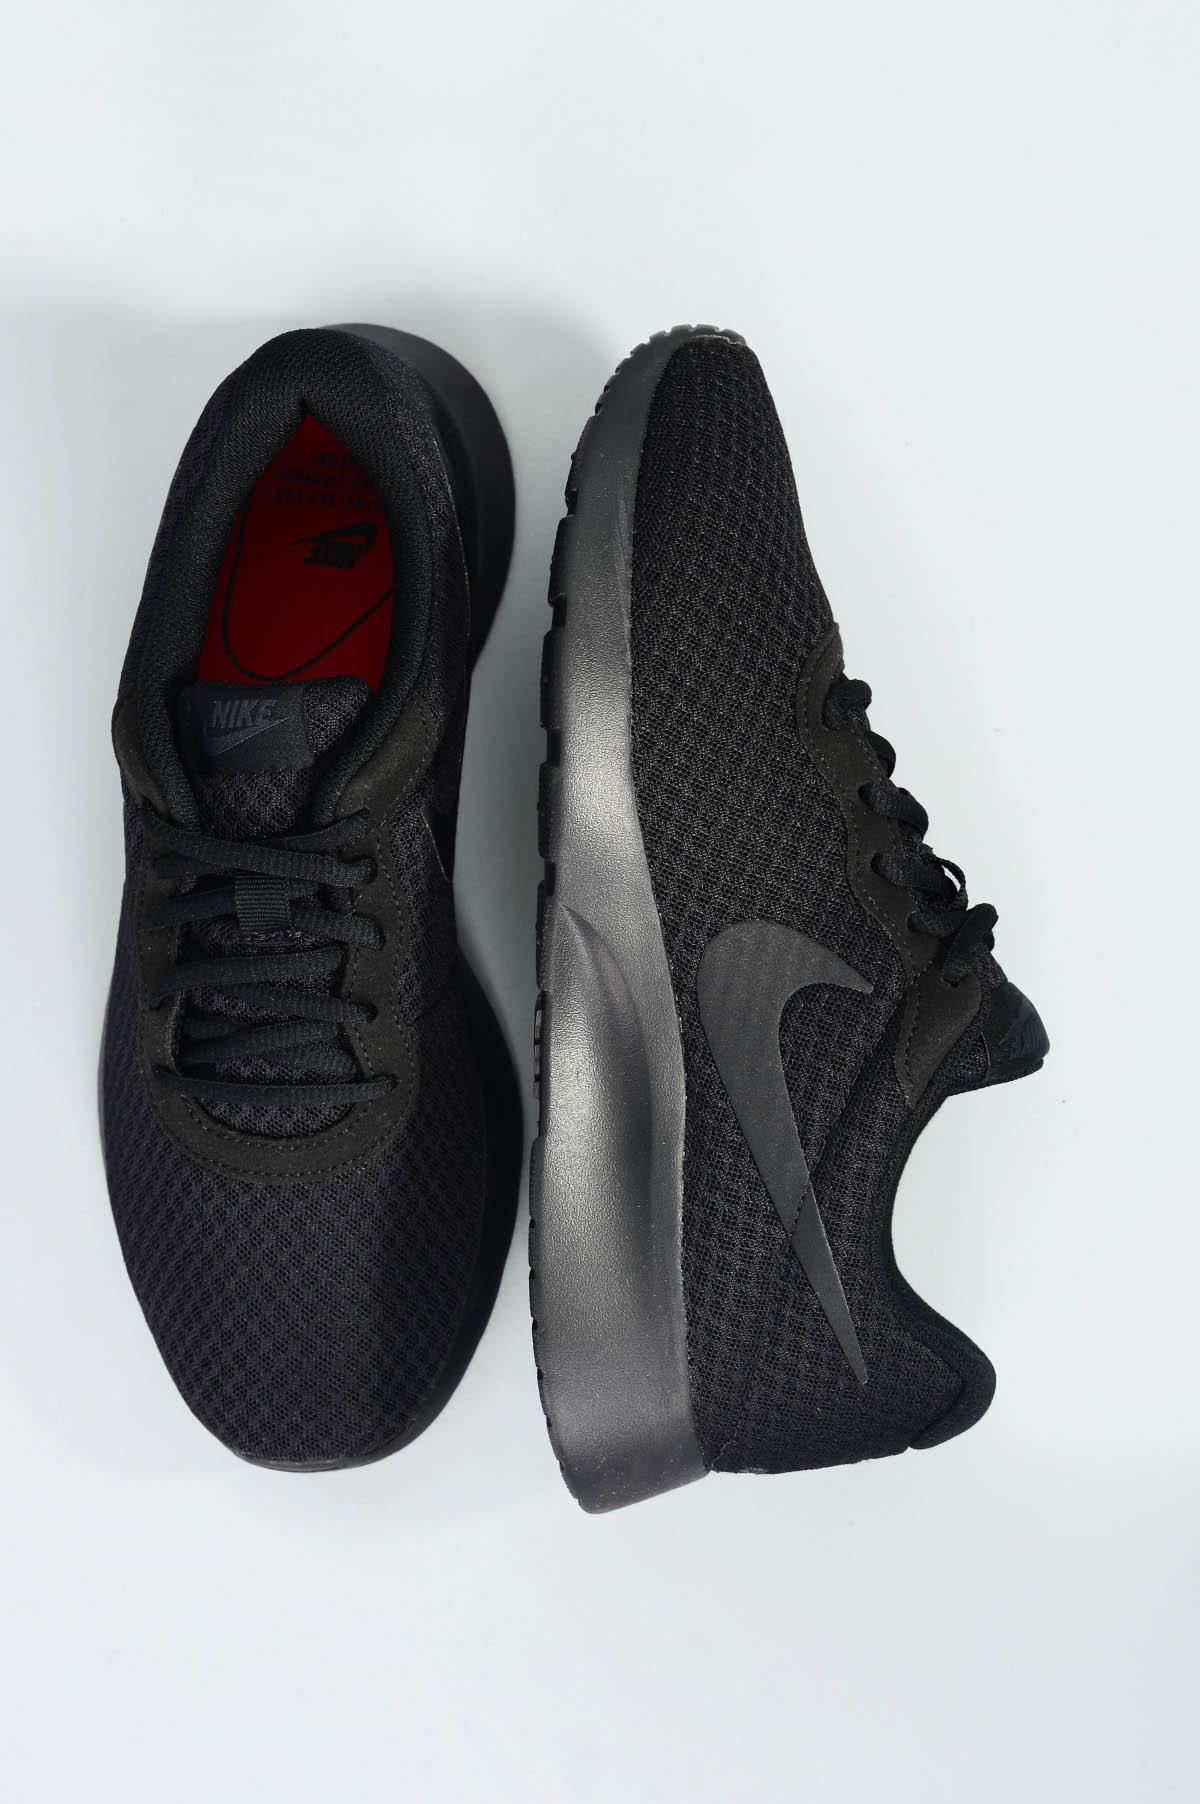 0482594e2f Tênis Masculino Nike Tanjun DIVERSOS - PRETO - Mundial Calçados